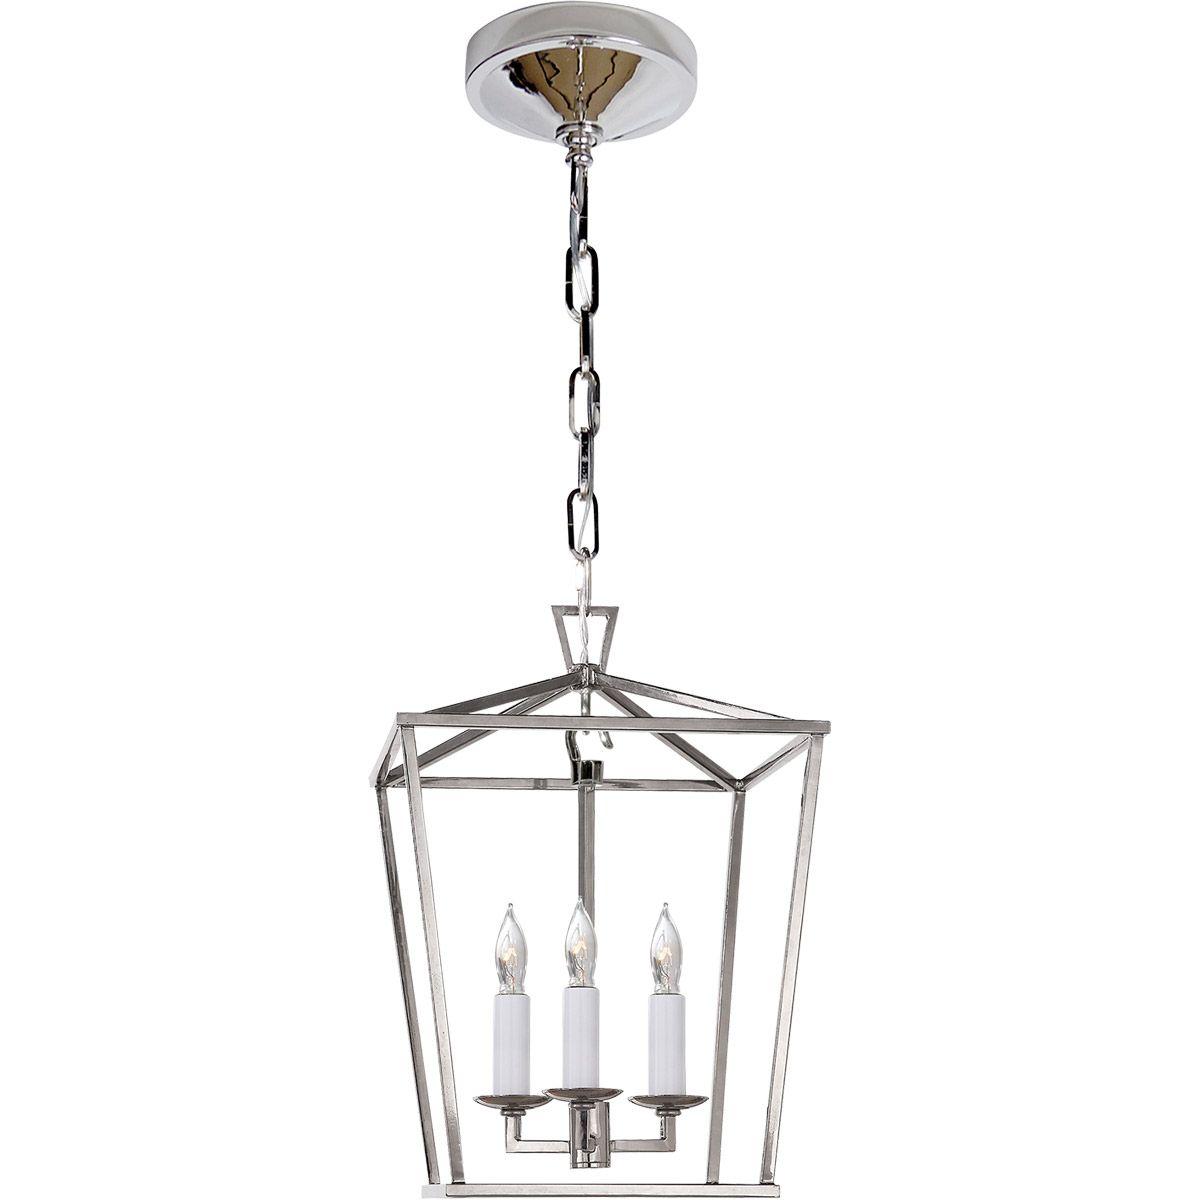 Visual Comfort Chc2175pn E F Chapman Darlana 3 Light 10 Inch Polished Nickel Foyer Pendant Ceiling Light Mini Lantern Pendant Light Lantern Pendant Lighting Mini Lanterns